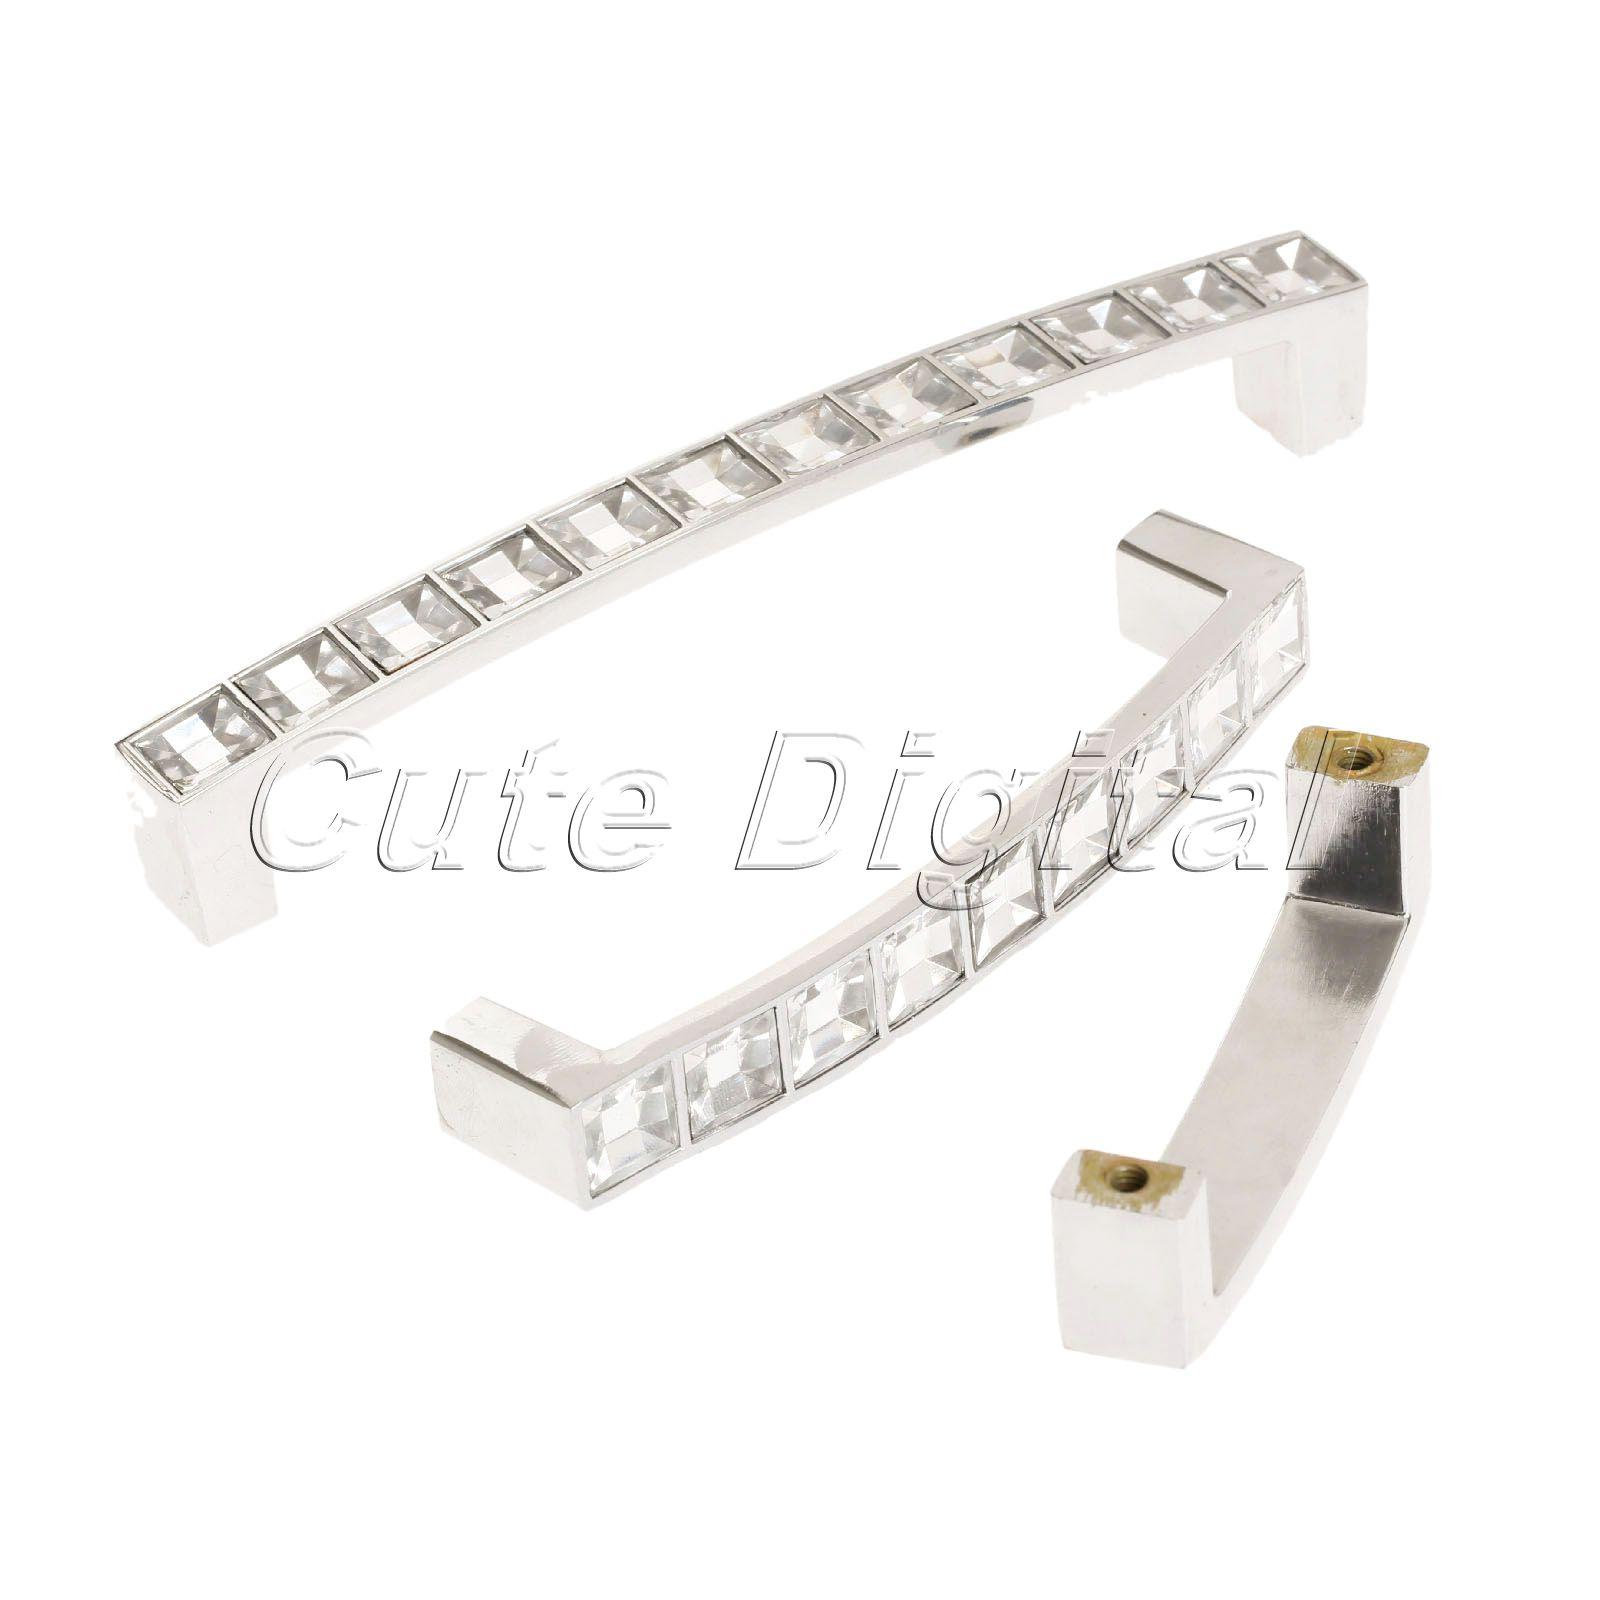 kitchen pull handles white diamond crystal door knobs and handles cabinet wardrobe cupboard kitchen pull handle furniture hole distance 6496128mm ღ ƸӜƷ ღdiamond